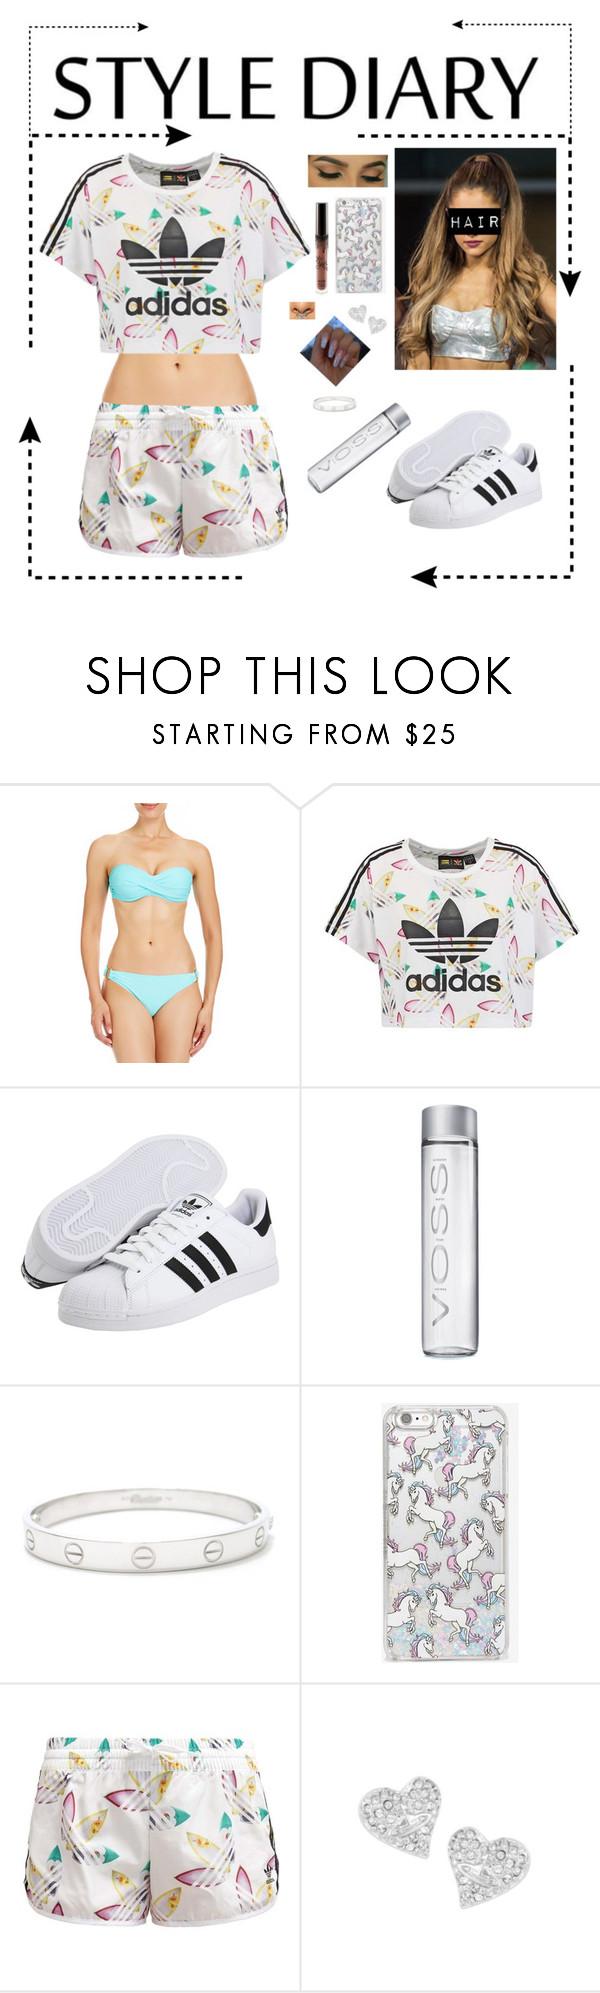 """Style Diary"" by niih-malik69 on Polyvore featuring beleza, 2b bebe, adidas Originals, Cartier, Skinnydip, Vivienne Westwood e AdidasOriginals"